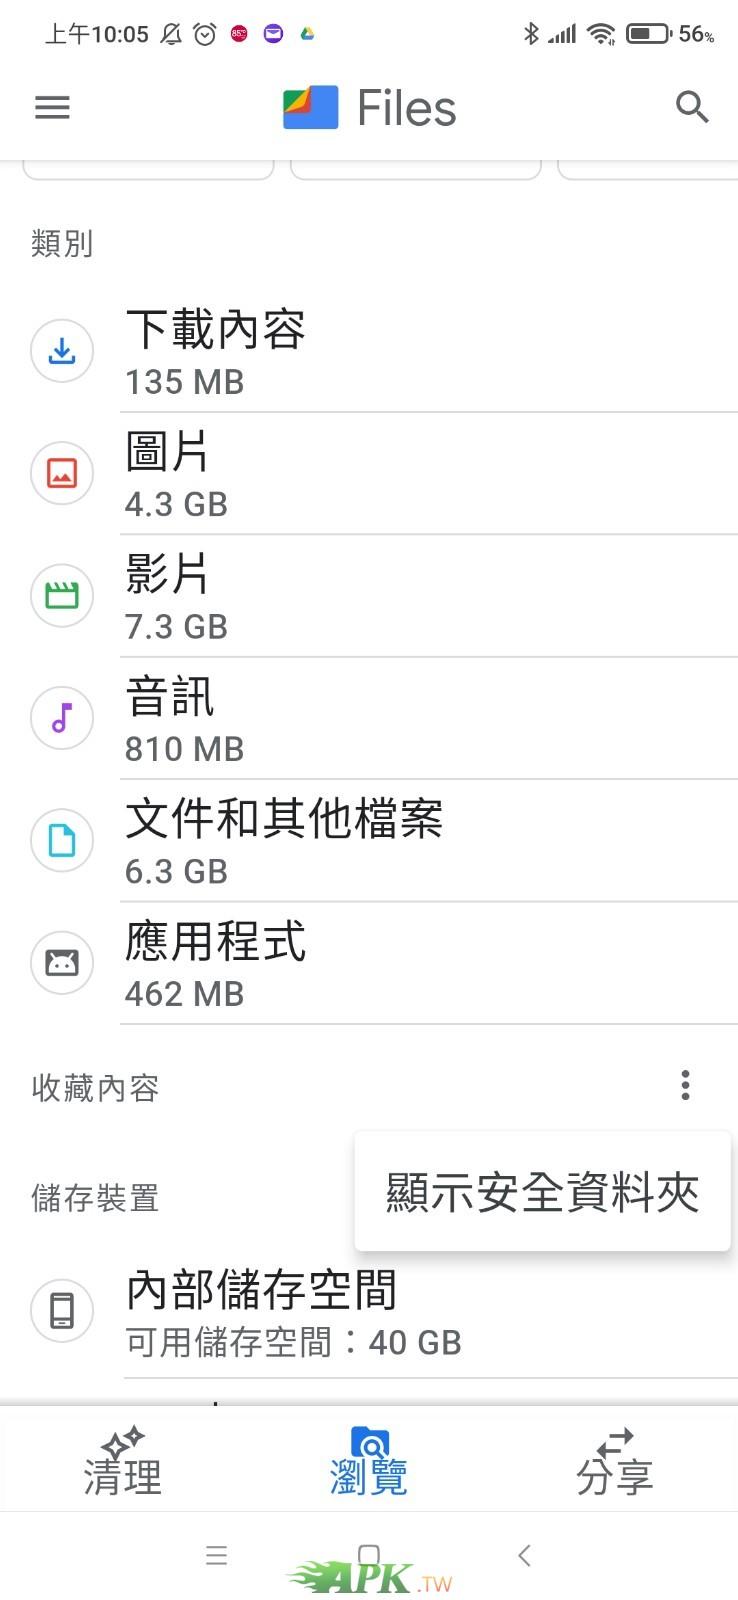 Screenshot_2021-05-12-10-05-41-139_com.google.android.apps.nbu.files.jpg